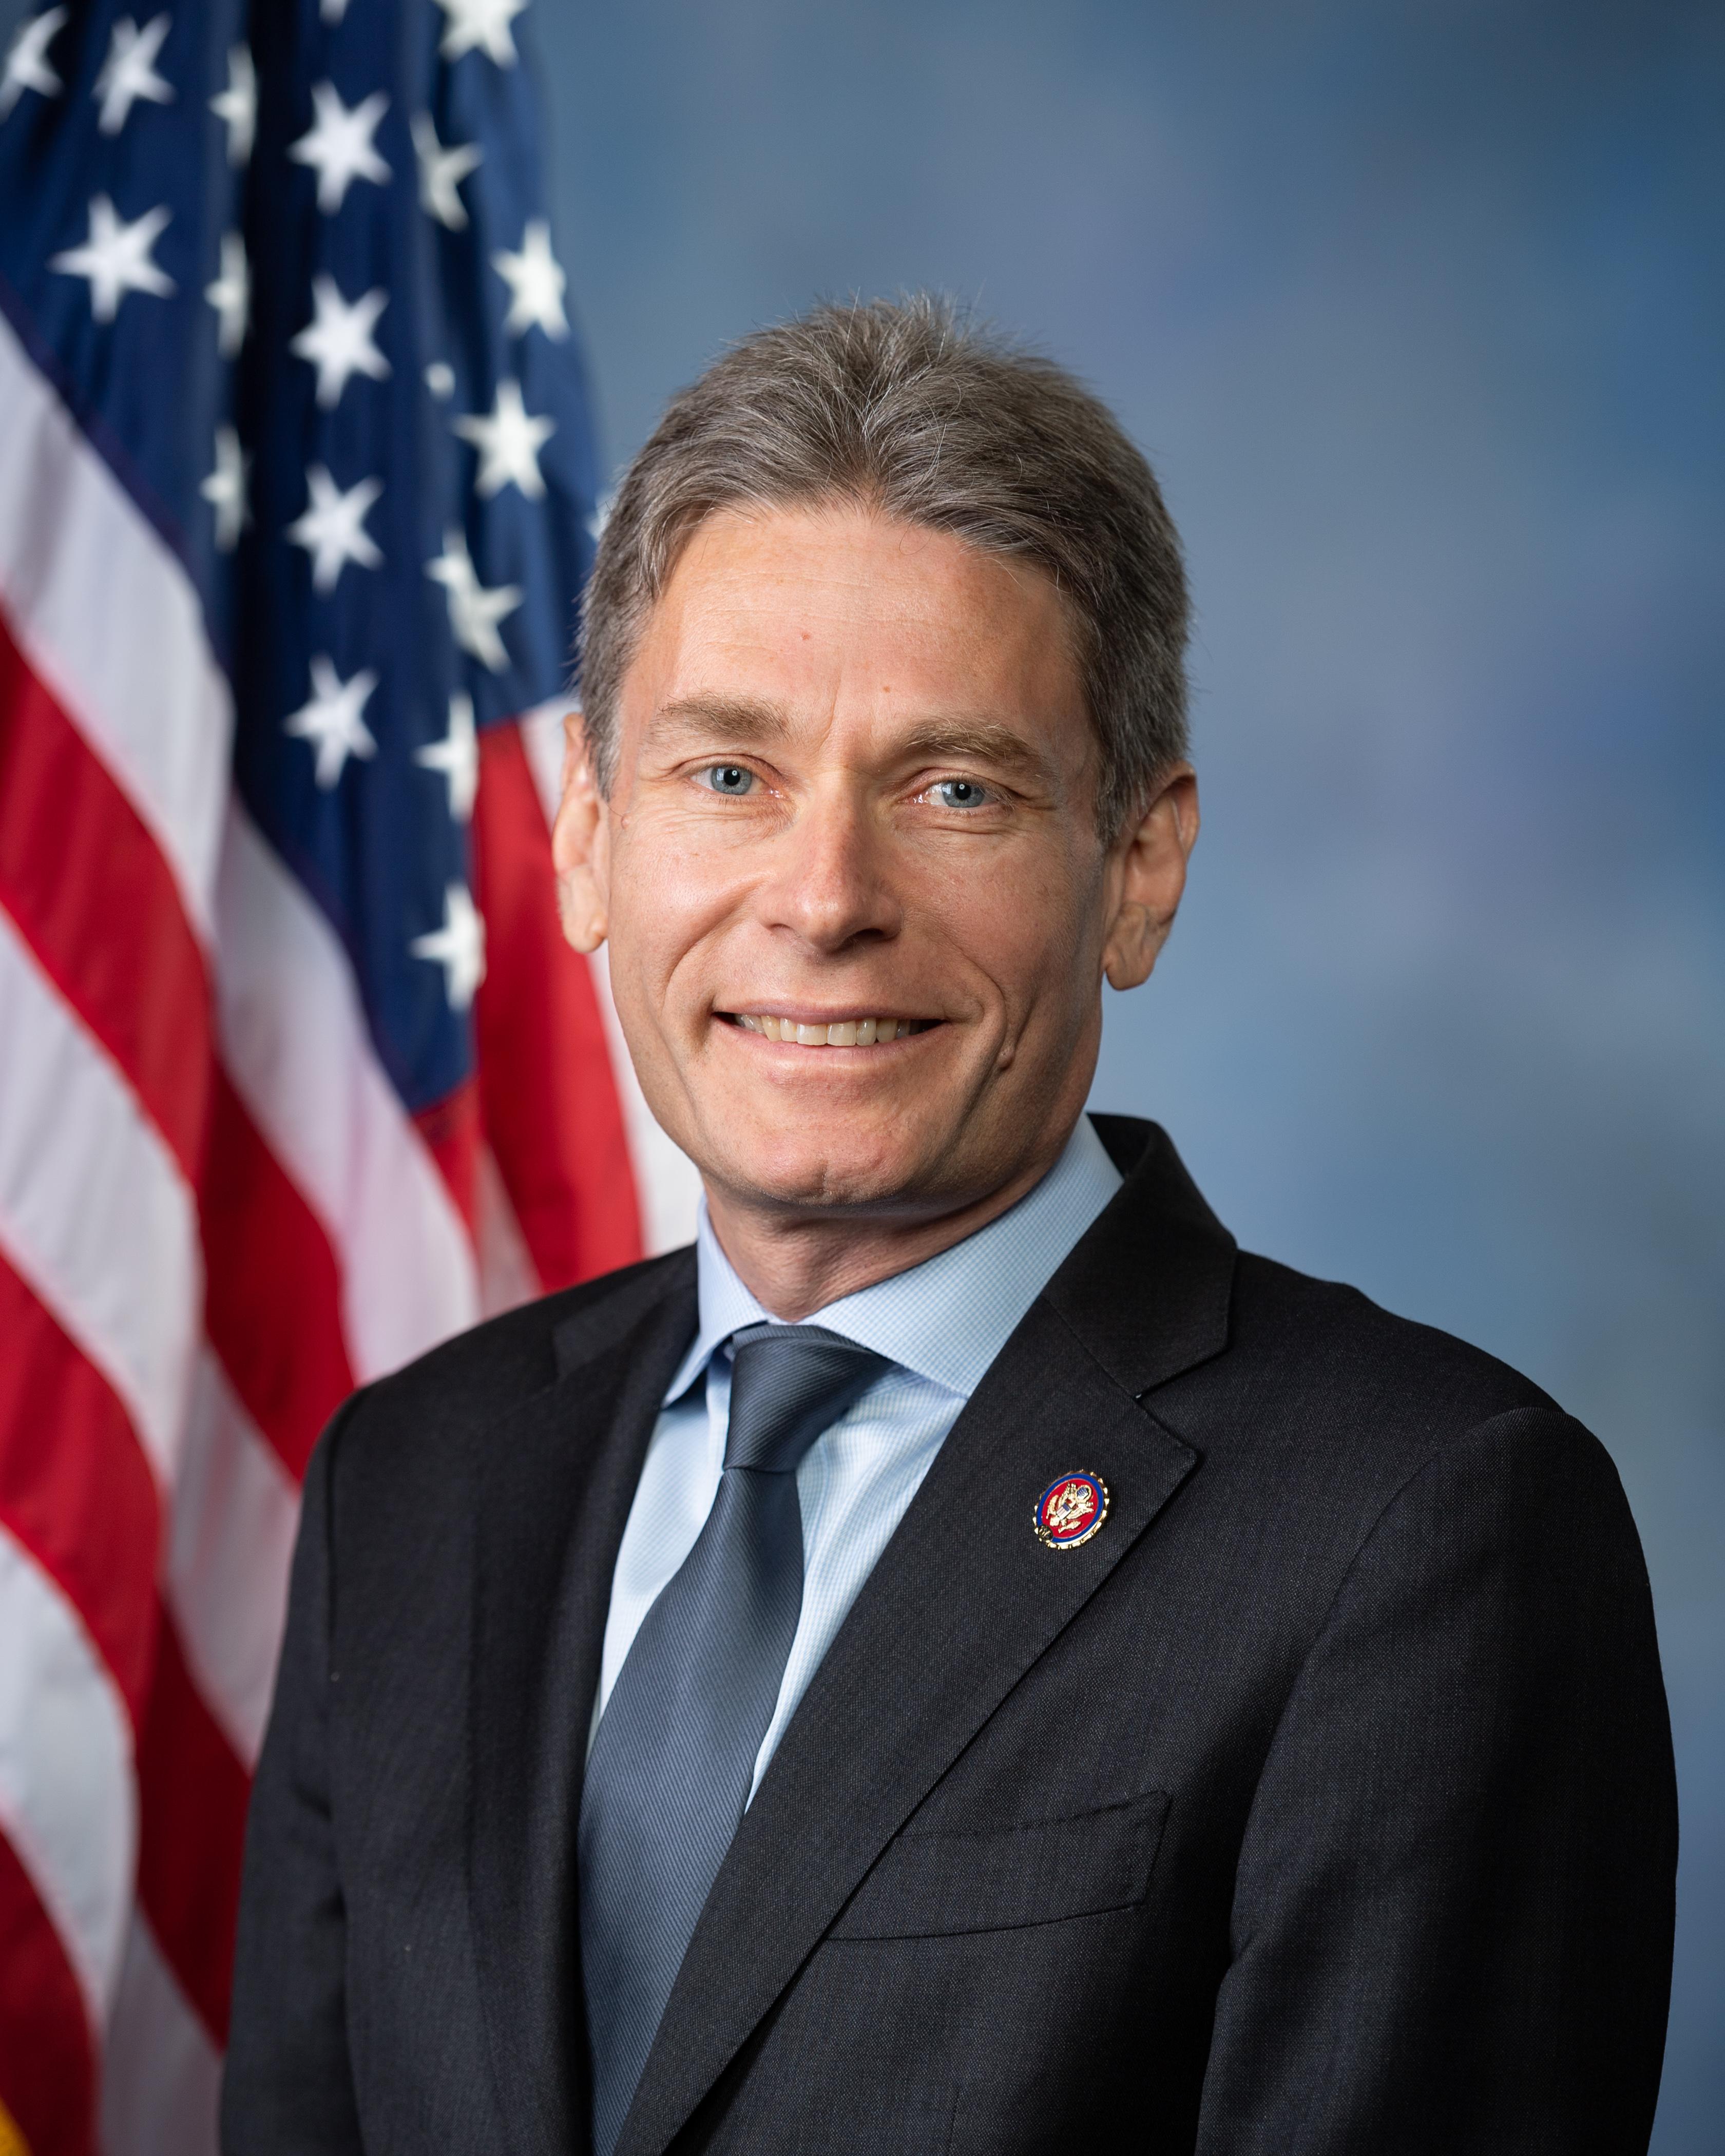 Congressman Tom Malinowski